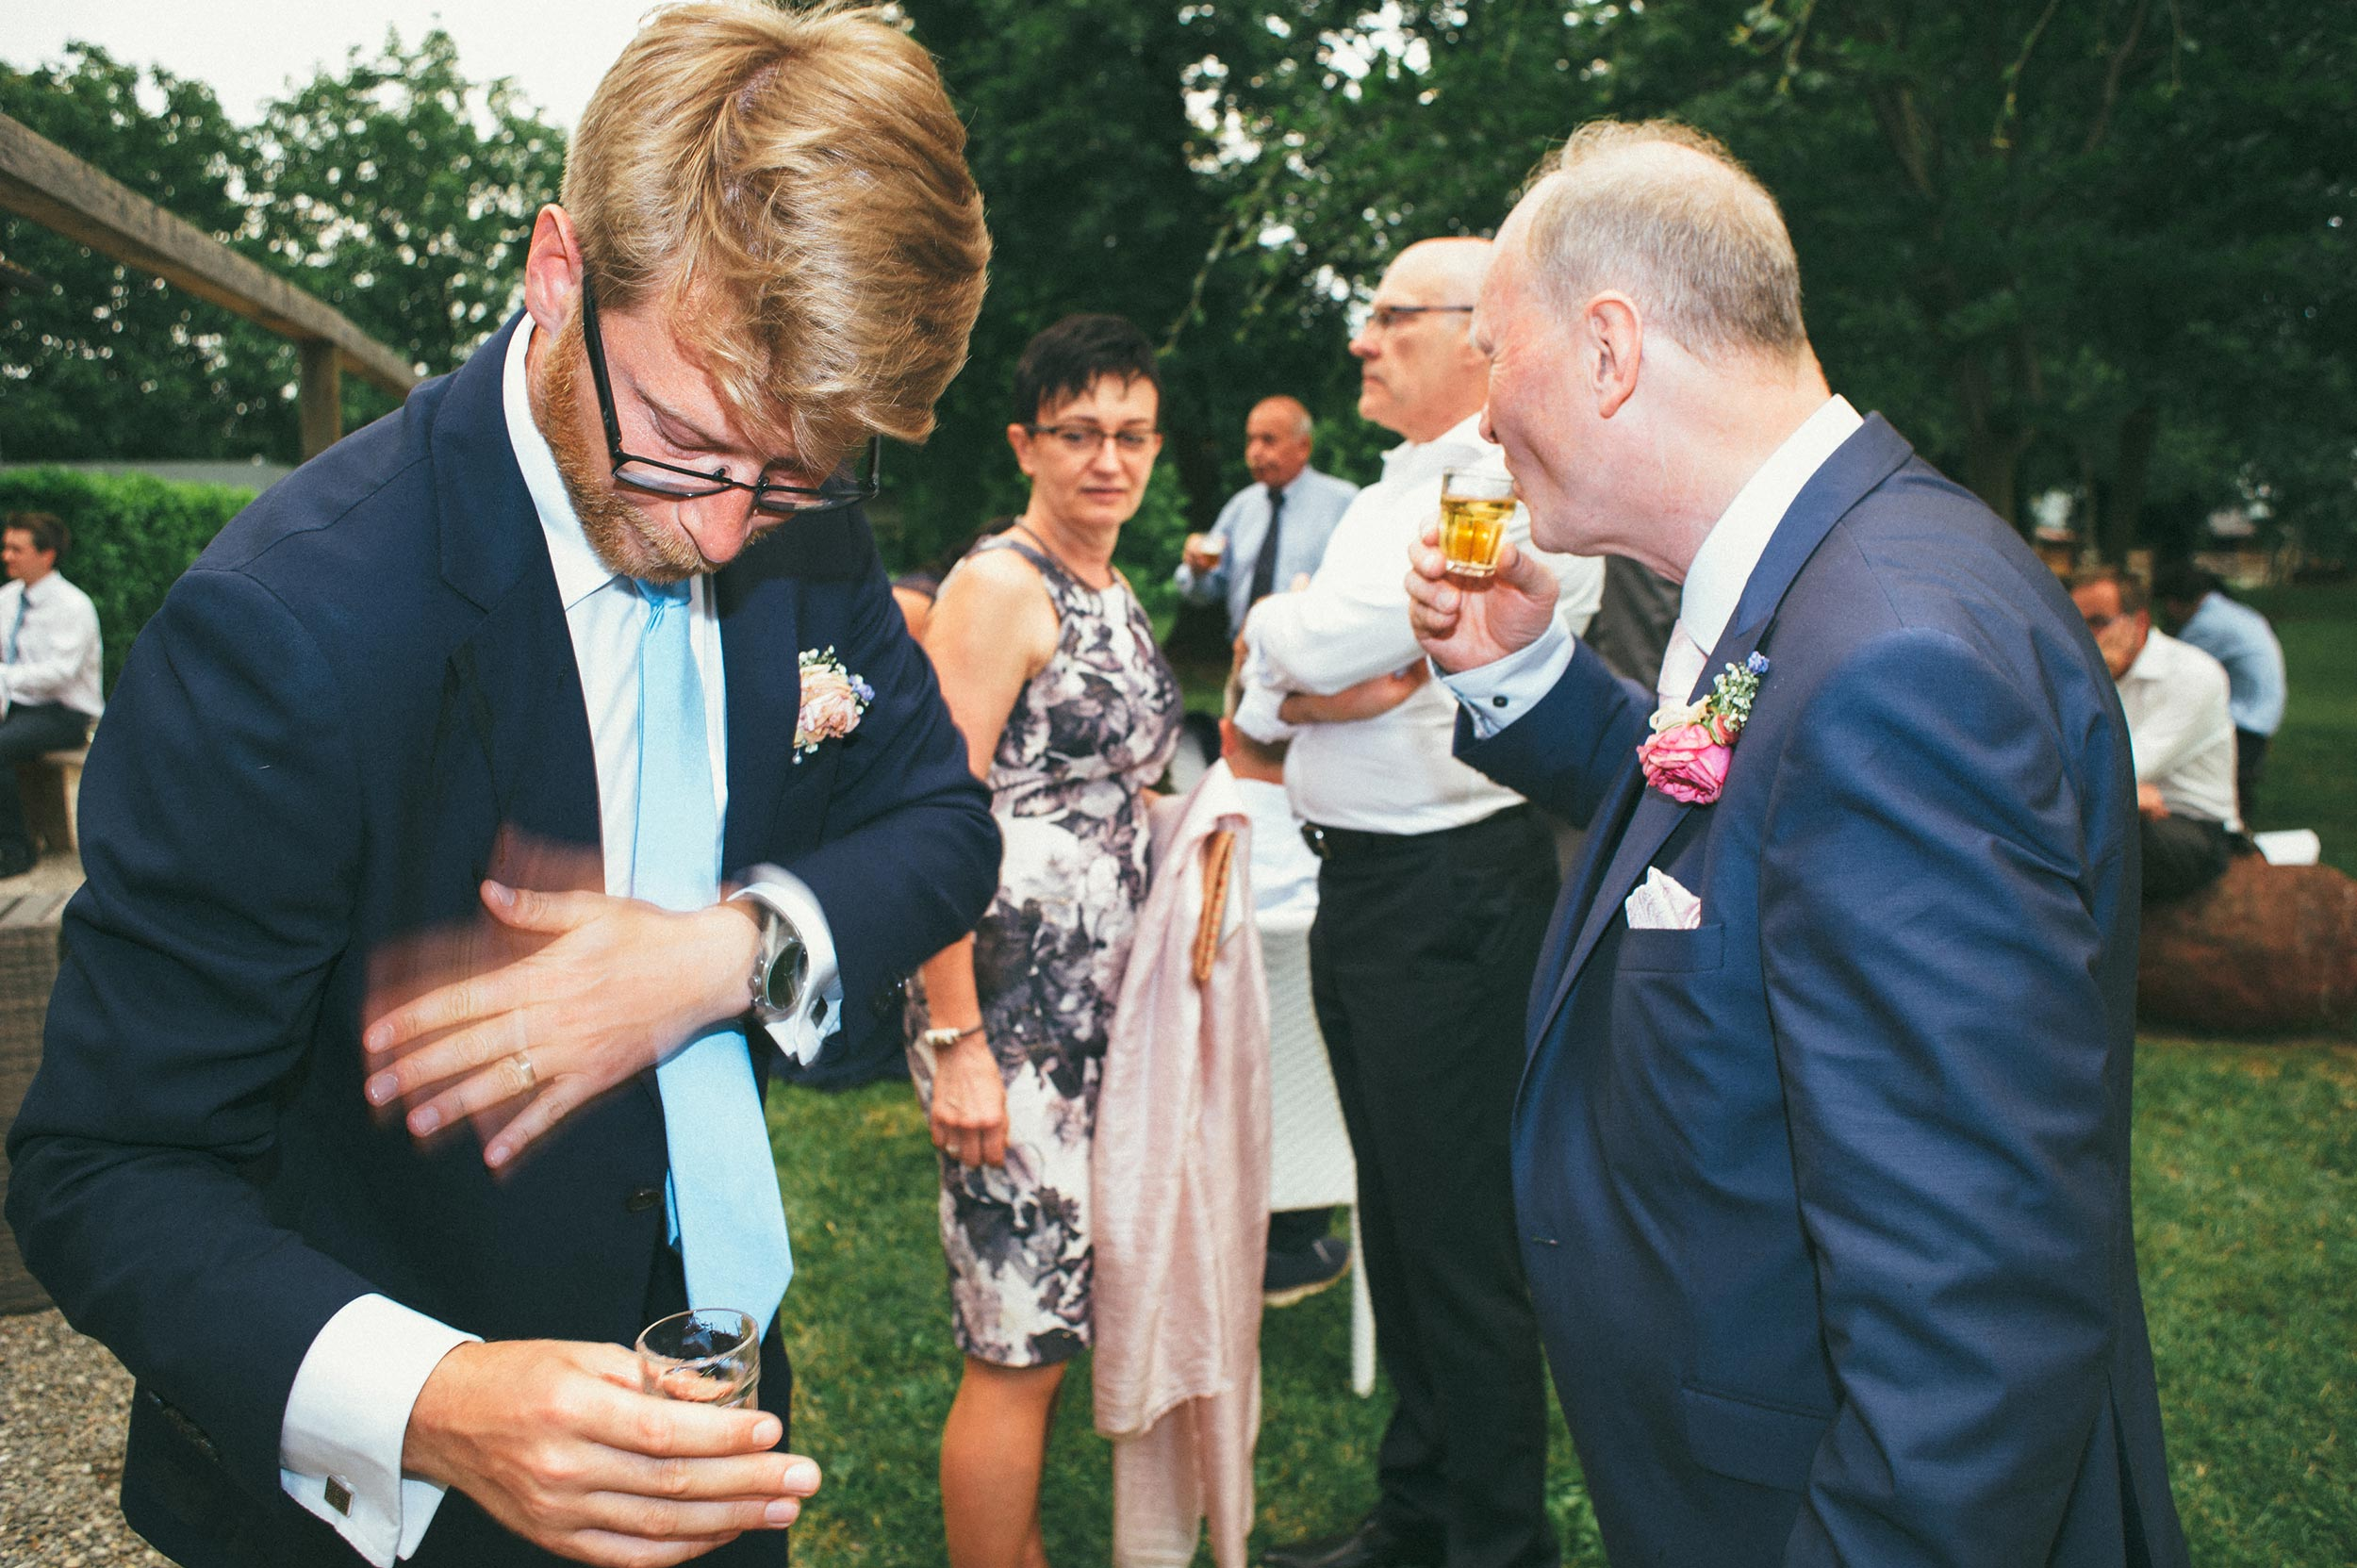 2016-Julius-Silke-Lake-Orta-Wedding-Photographer-Italy-Alessandro-Avenali-102.jpg